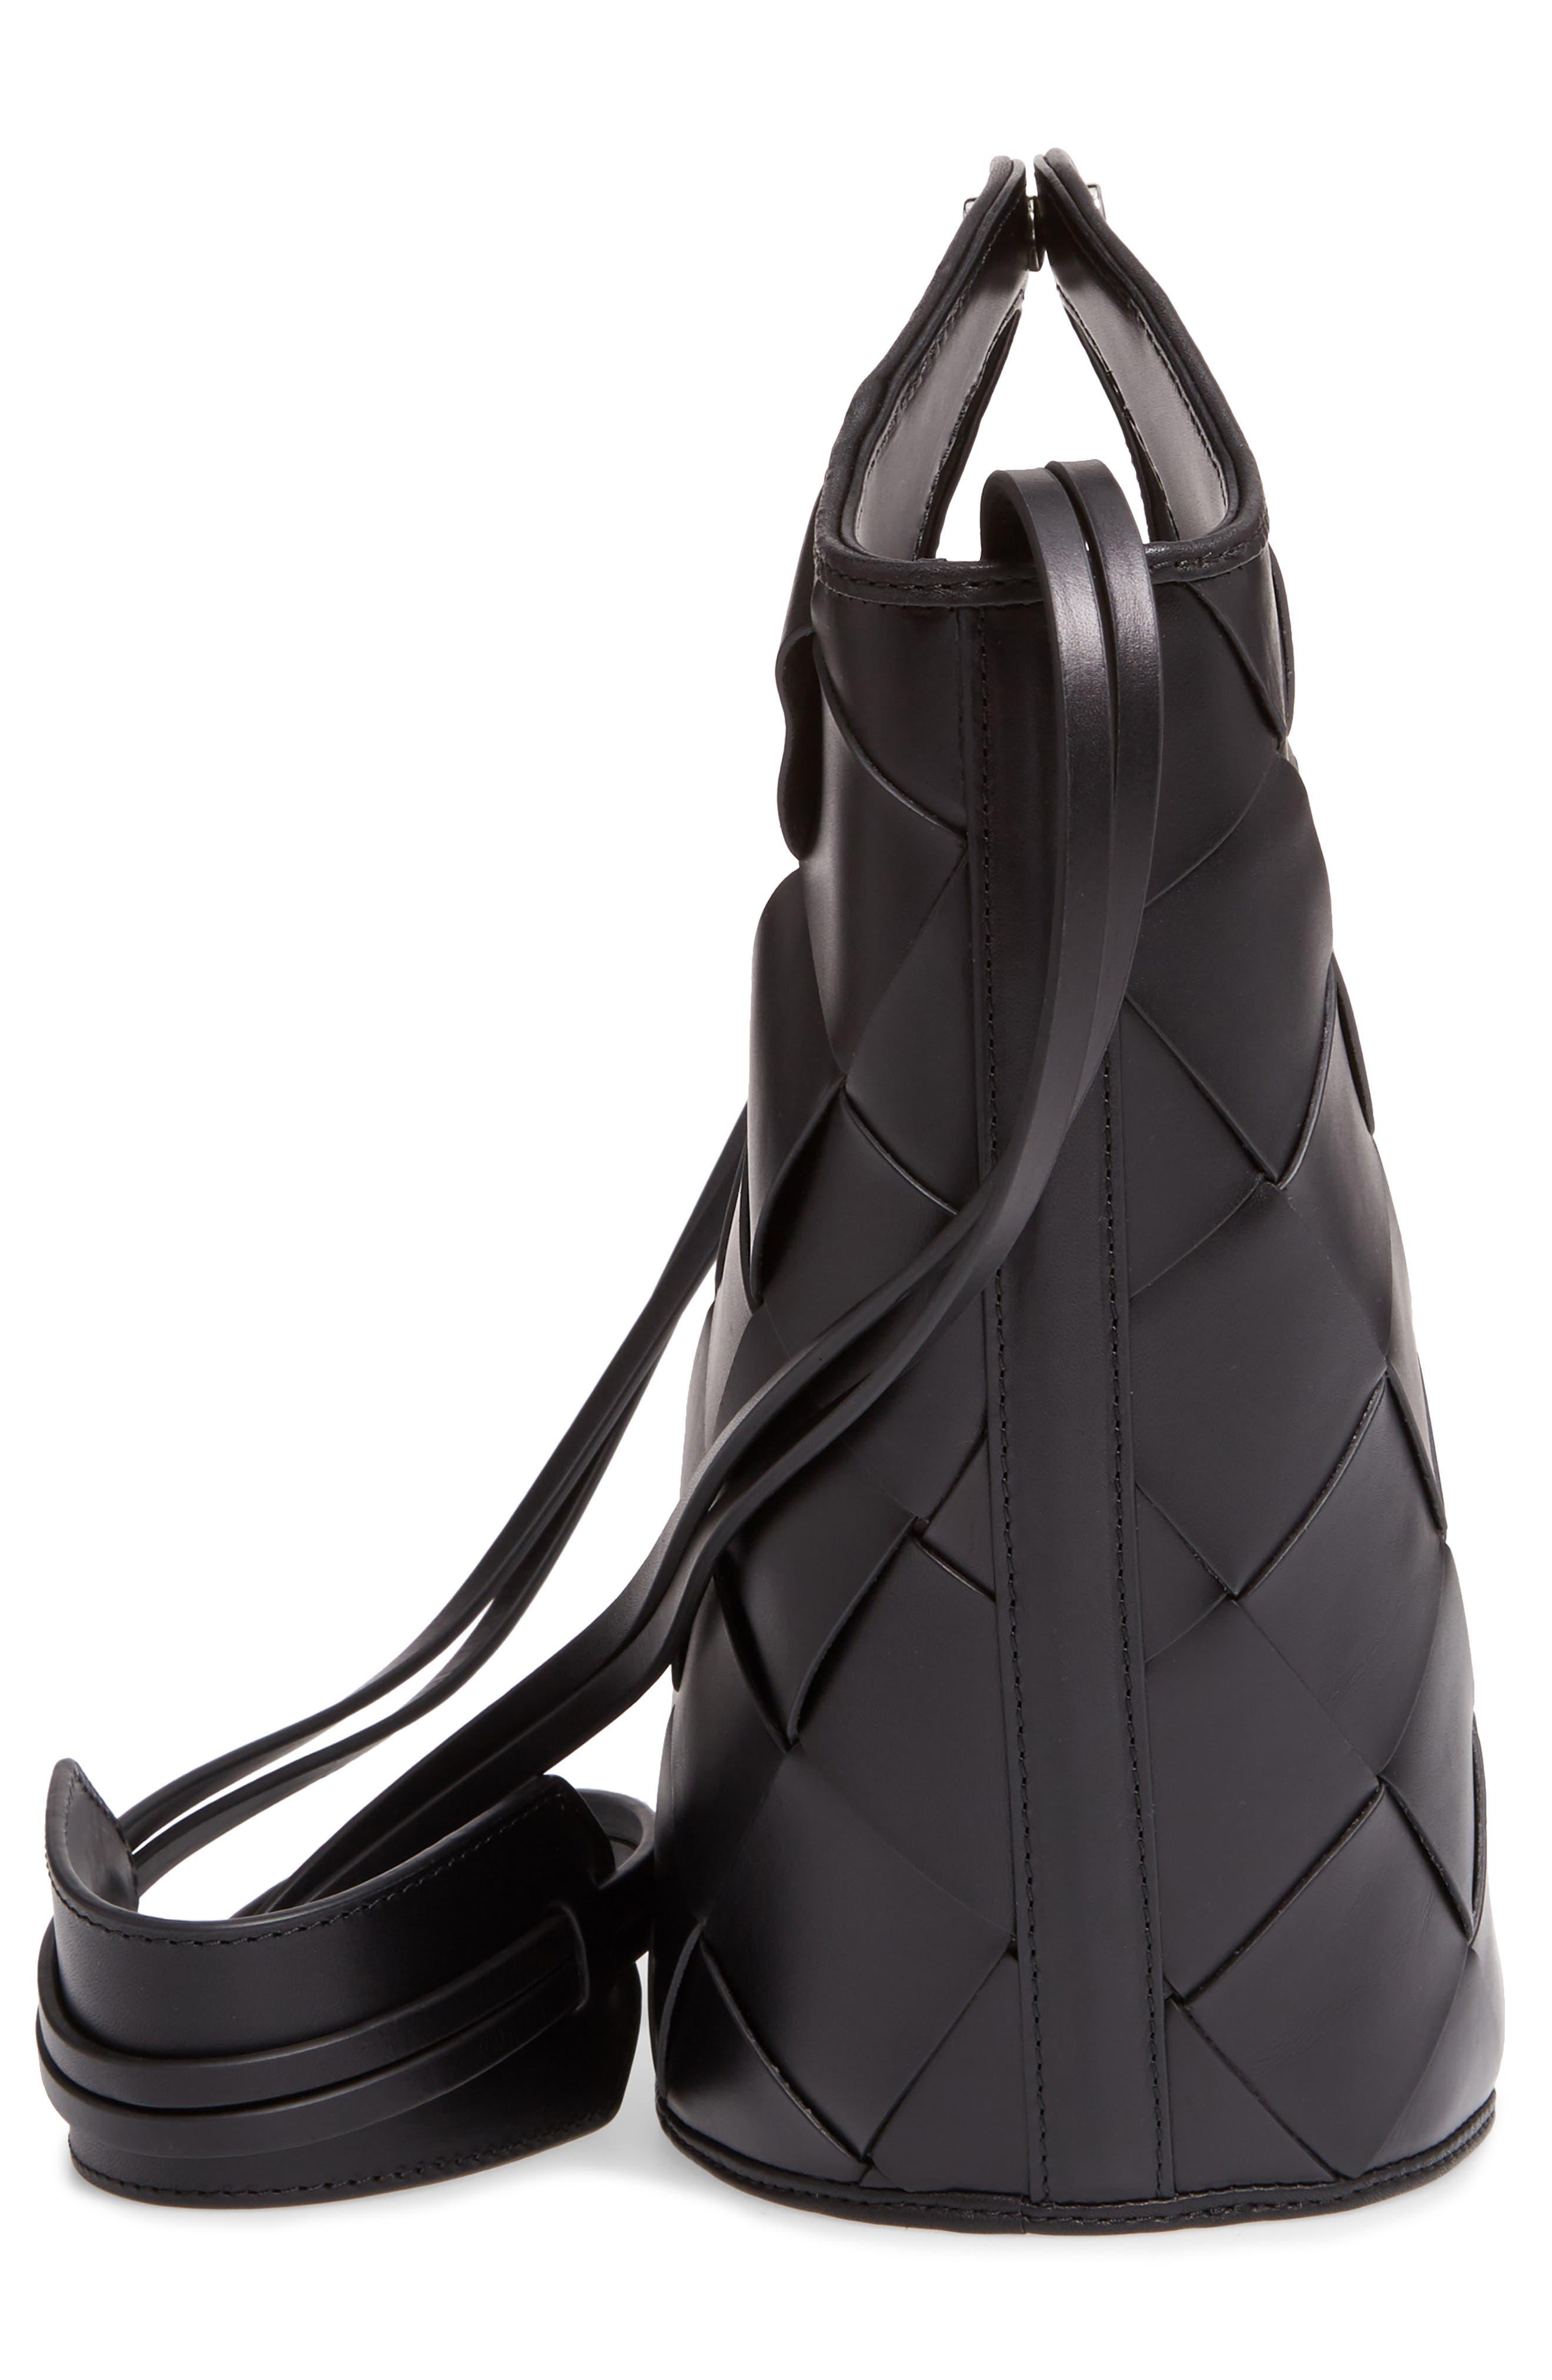 Small Market Woven Leather Crossbody Shopper,                             Alternate thumbnail 5, color,                             Black